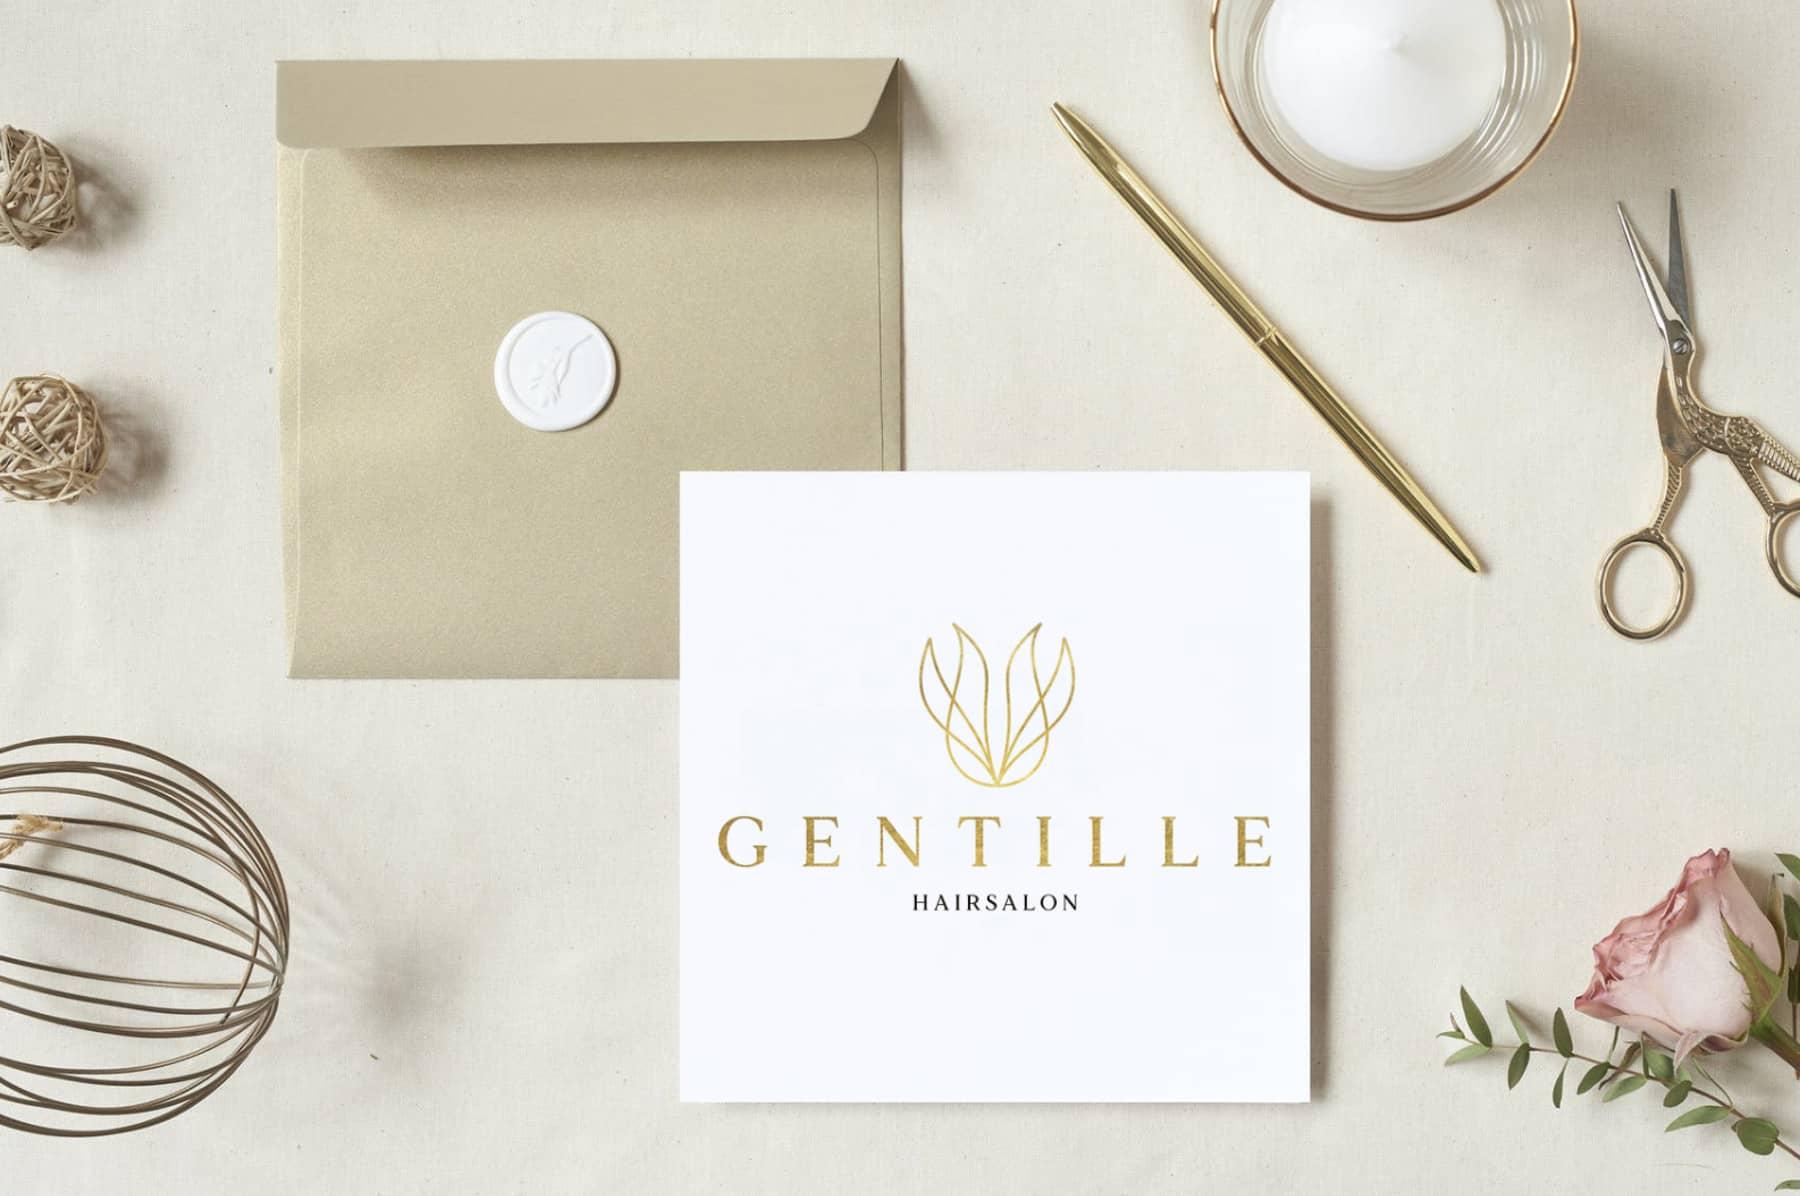 branding_gentille1-2